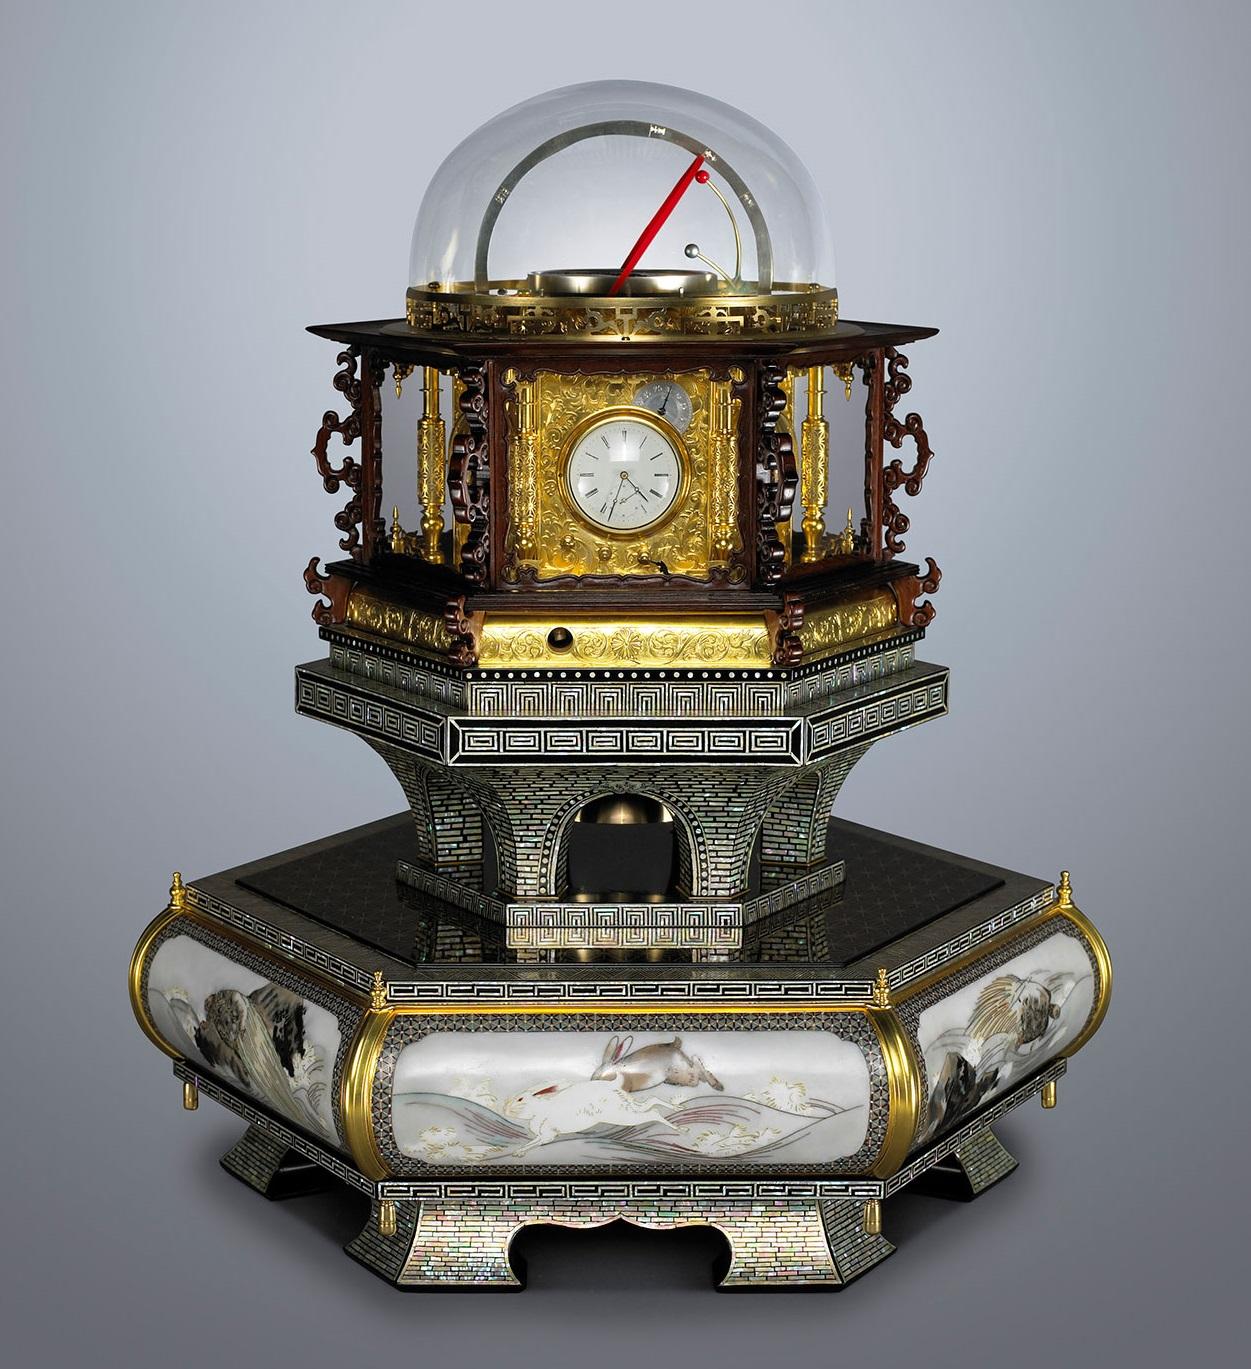 Tanaka-Hisashige-Myriad-Year-Clock-3